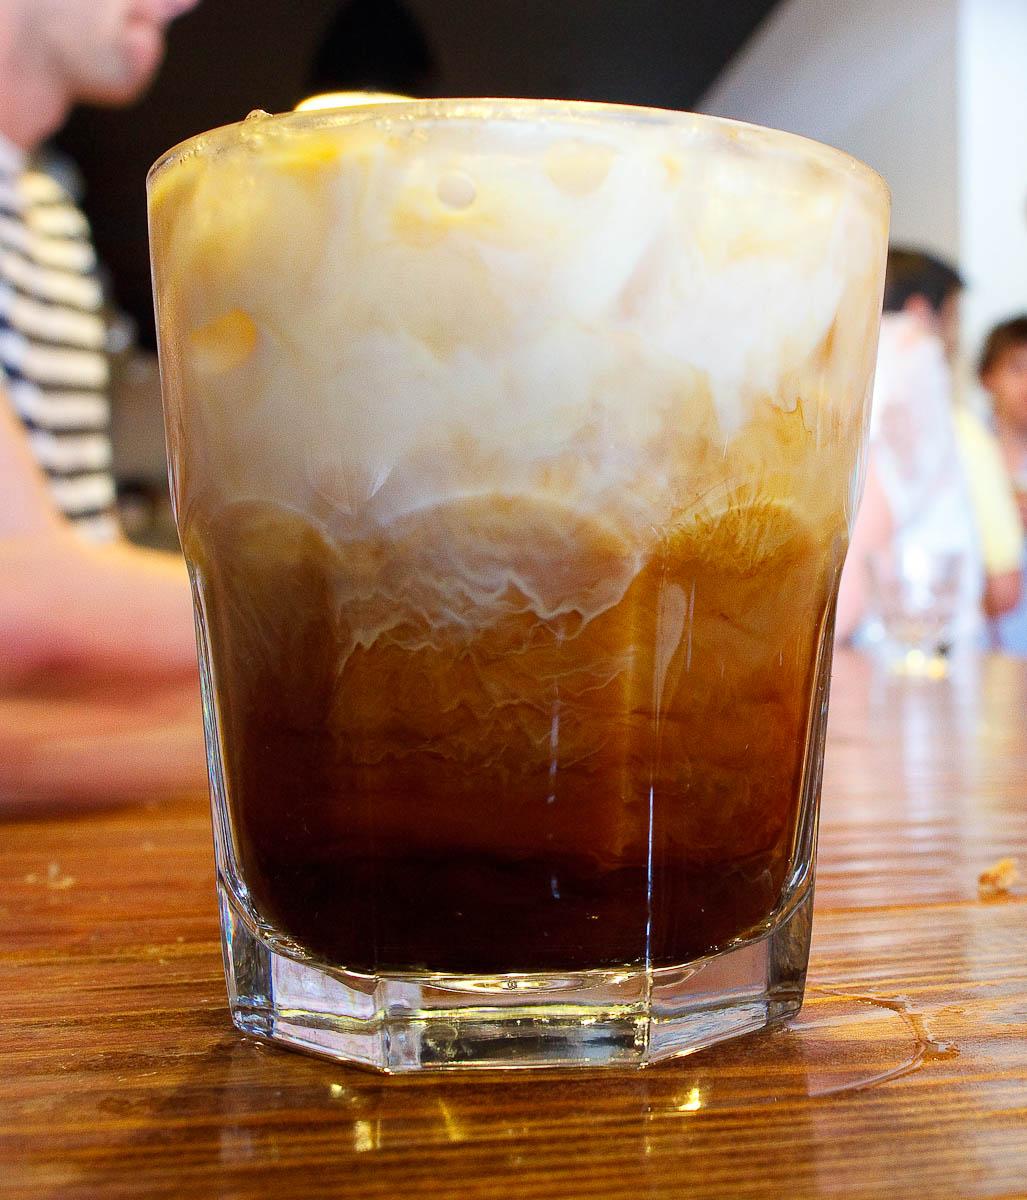 New Orleans Iced Coffee, unstirred milk